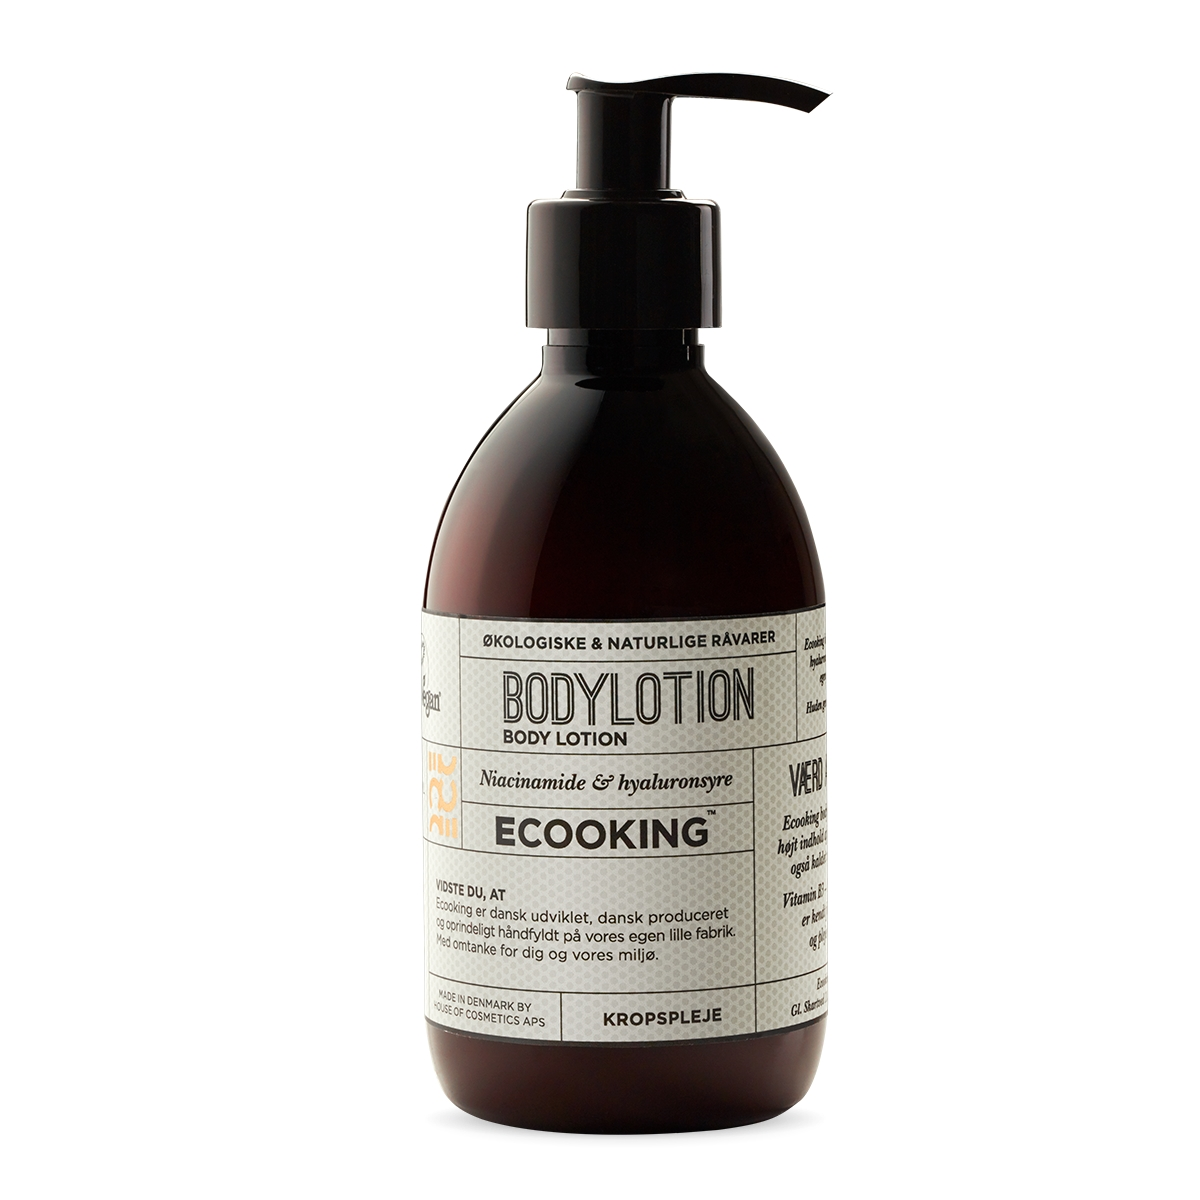 Ecooking Bodylotion, 300 ml